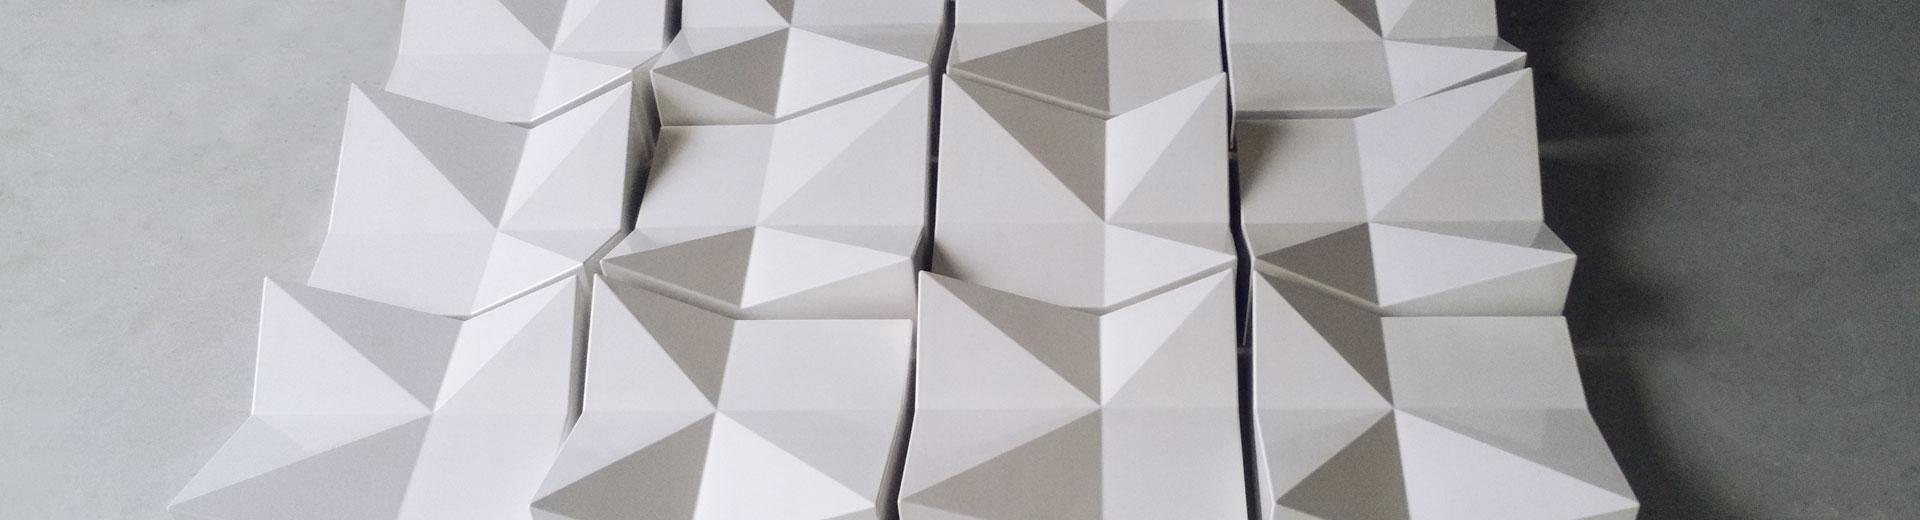 Kachel Gießkeramik Fassade